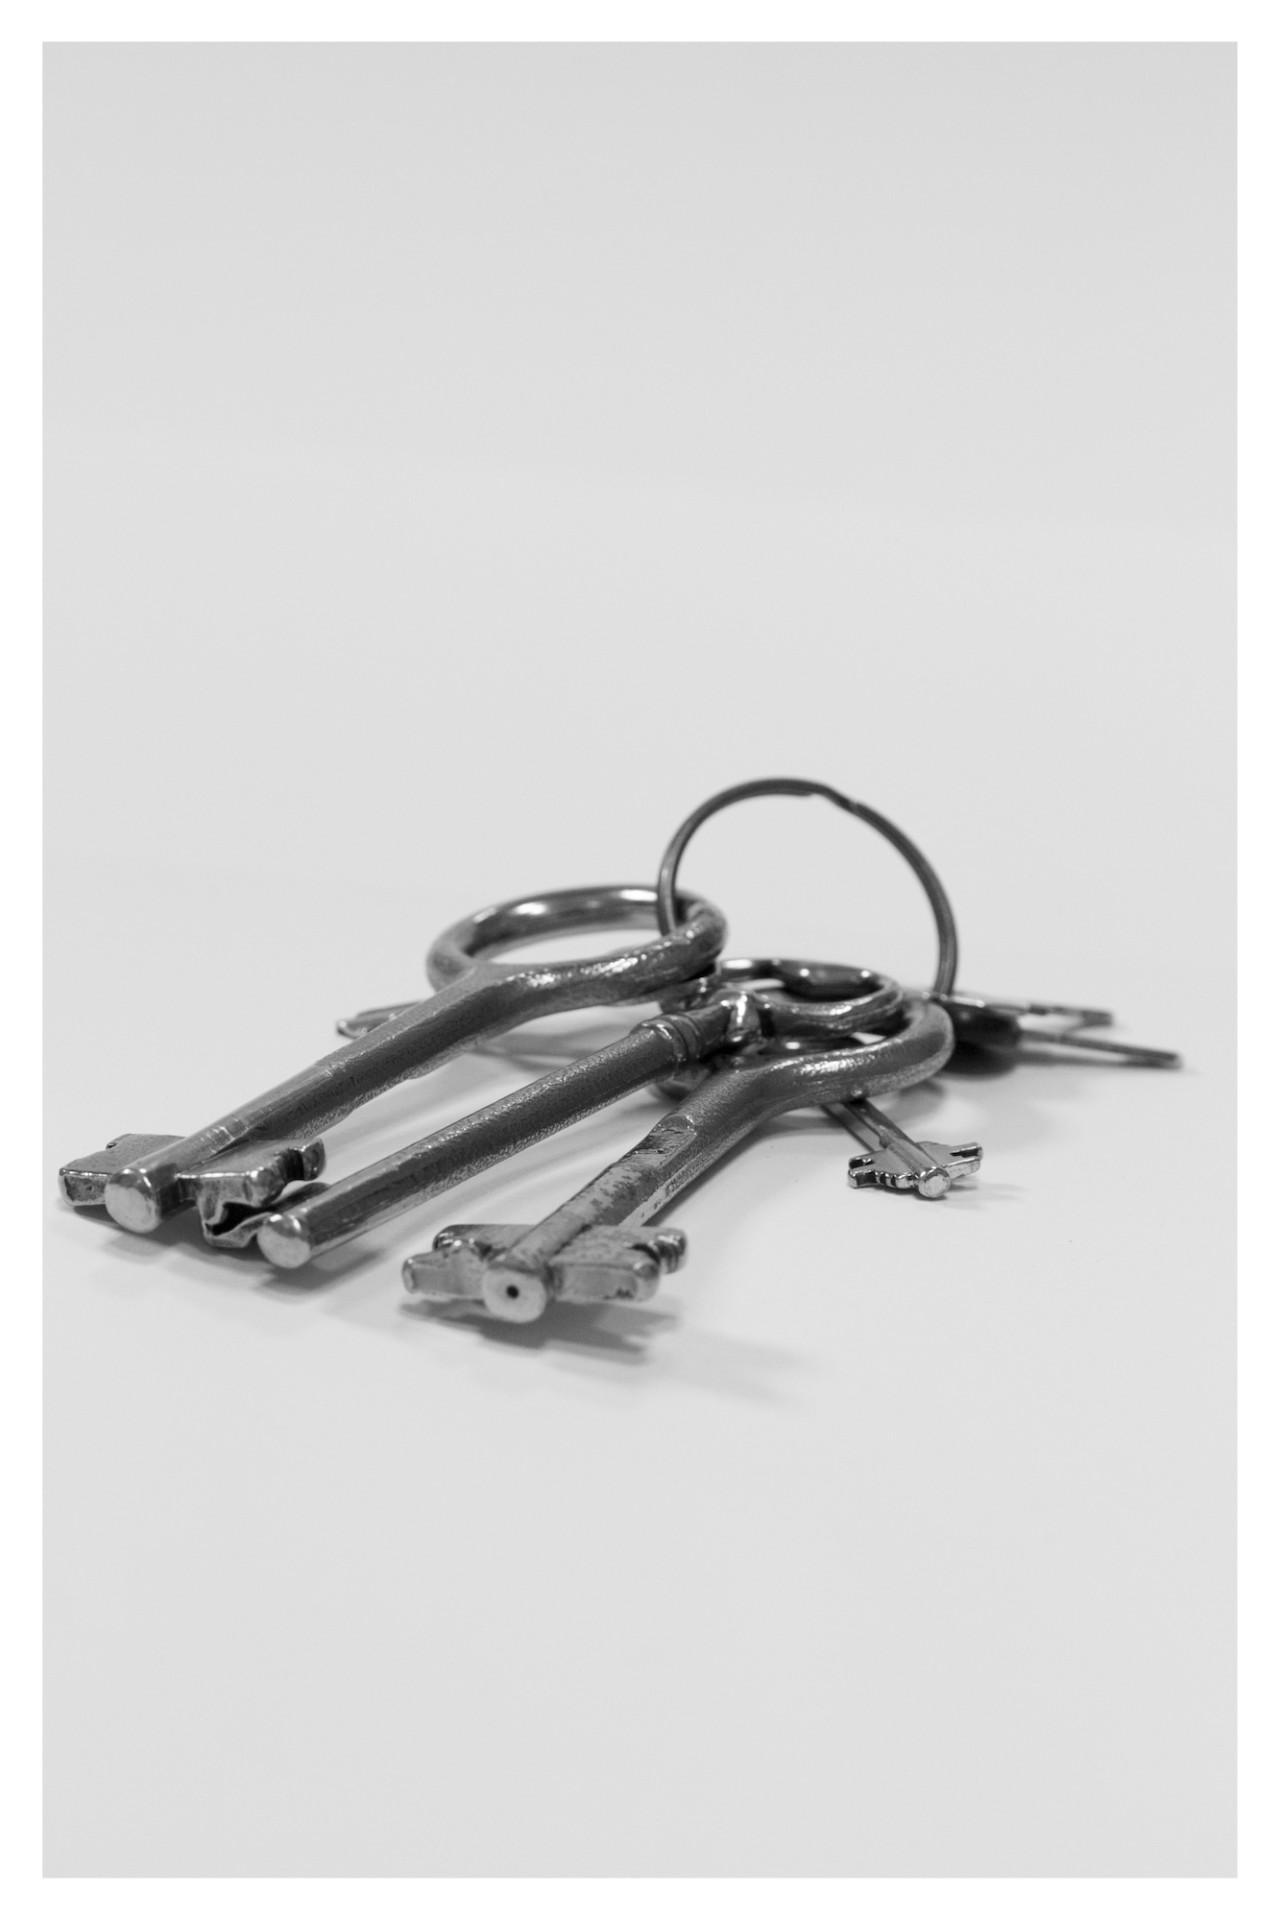 Prison Photography, 2014-2018